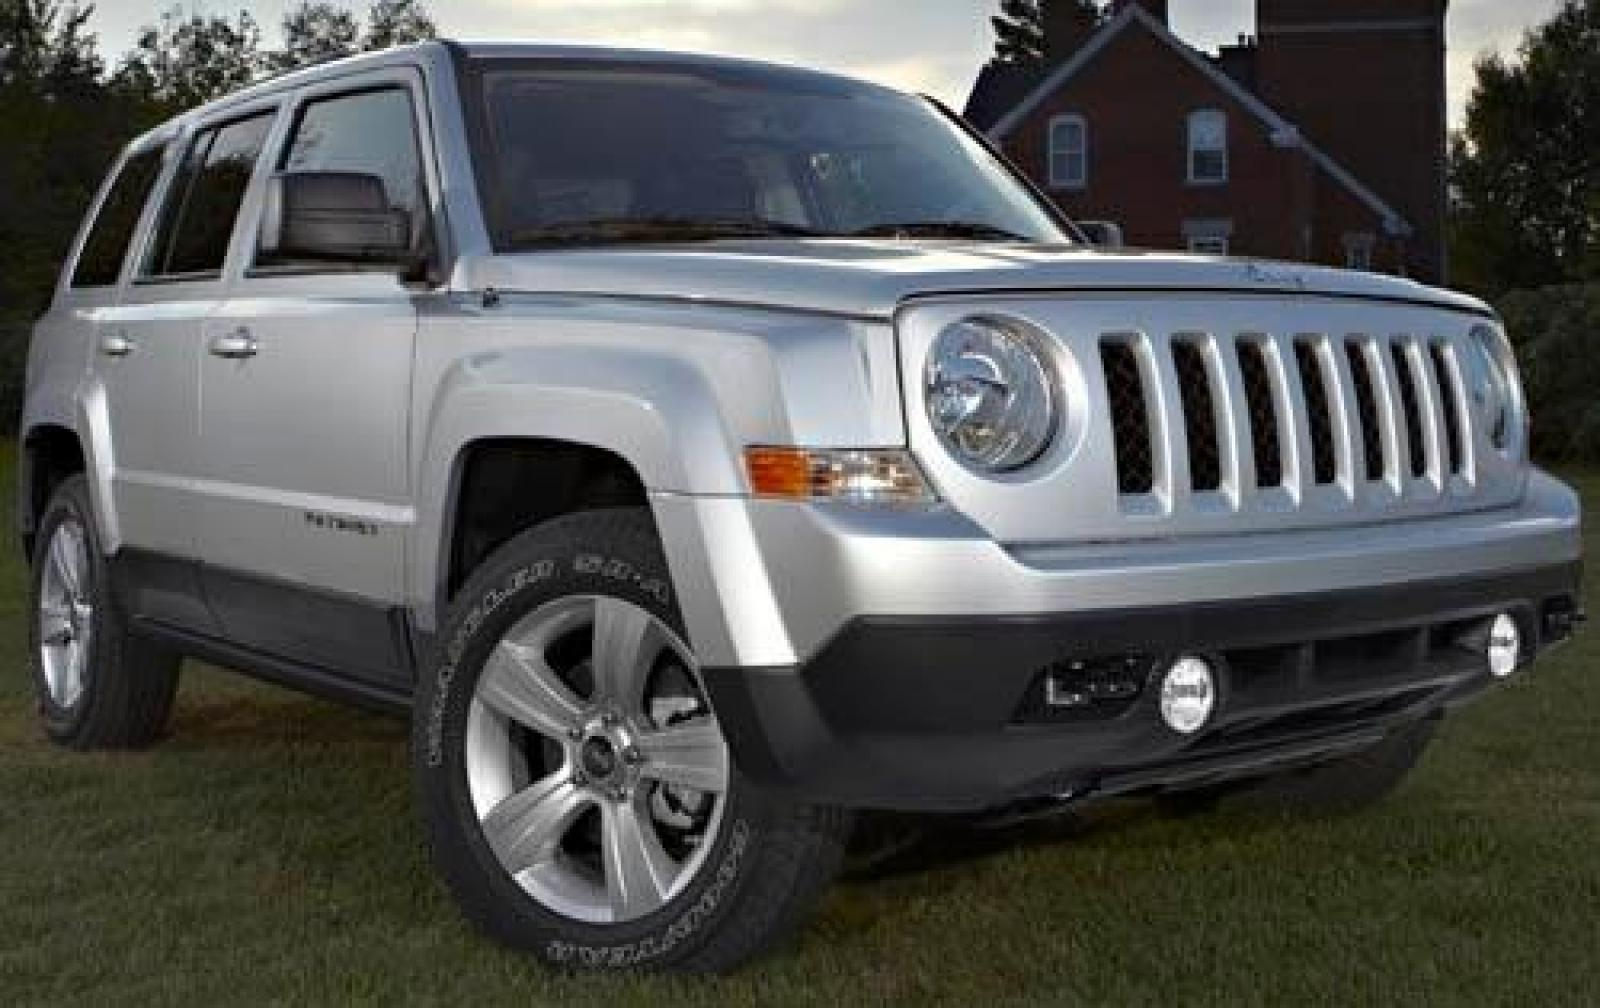 2011 Jeep Patriot #1 800 1024 1280 1600 Origin